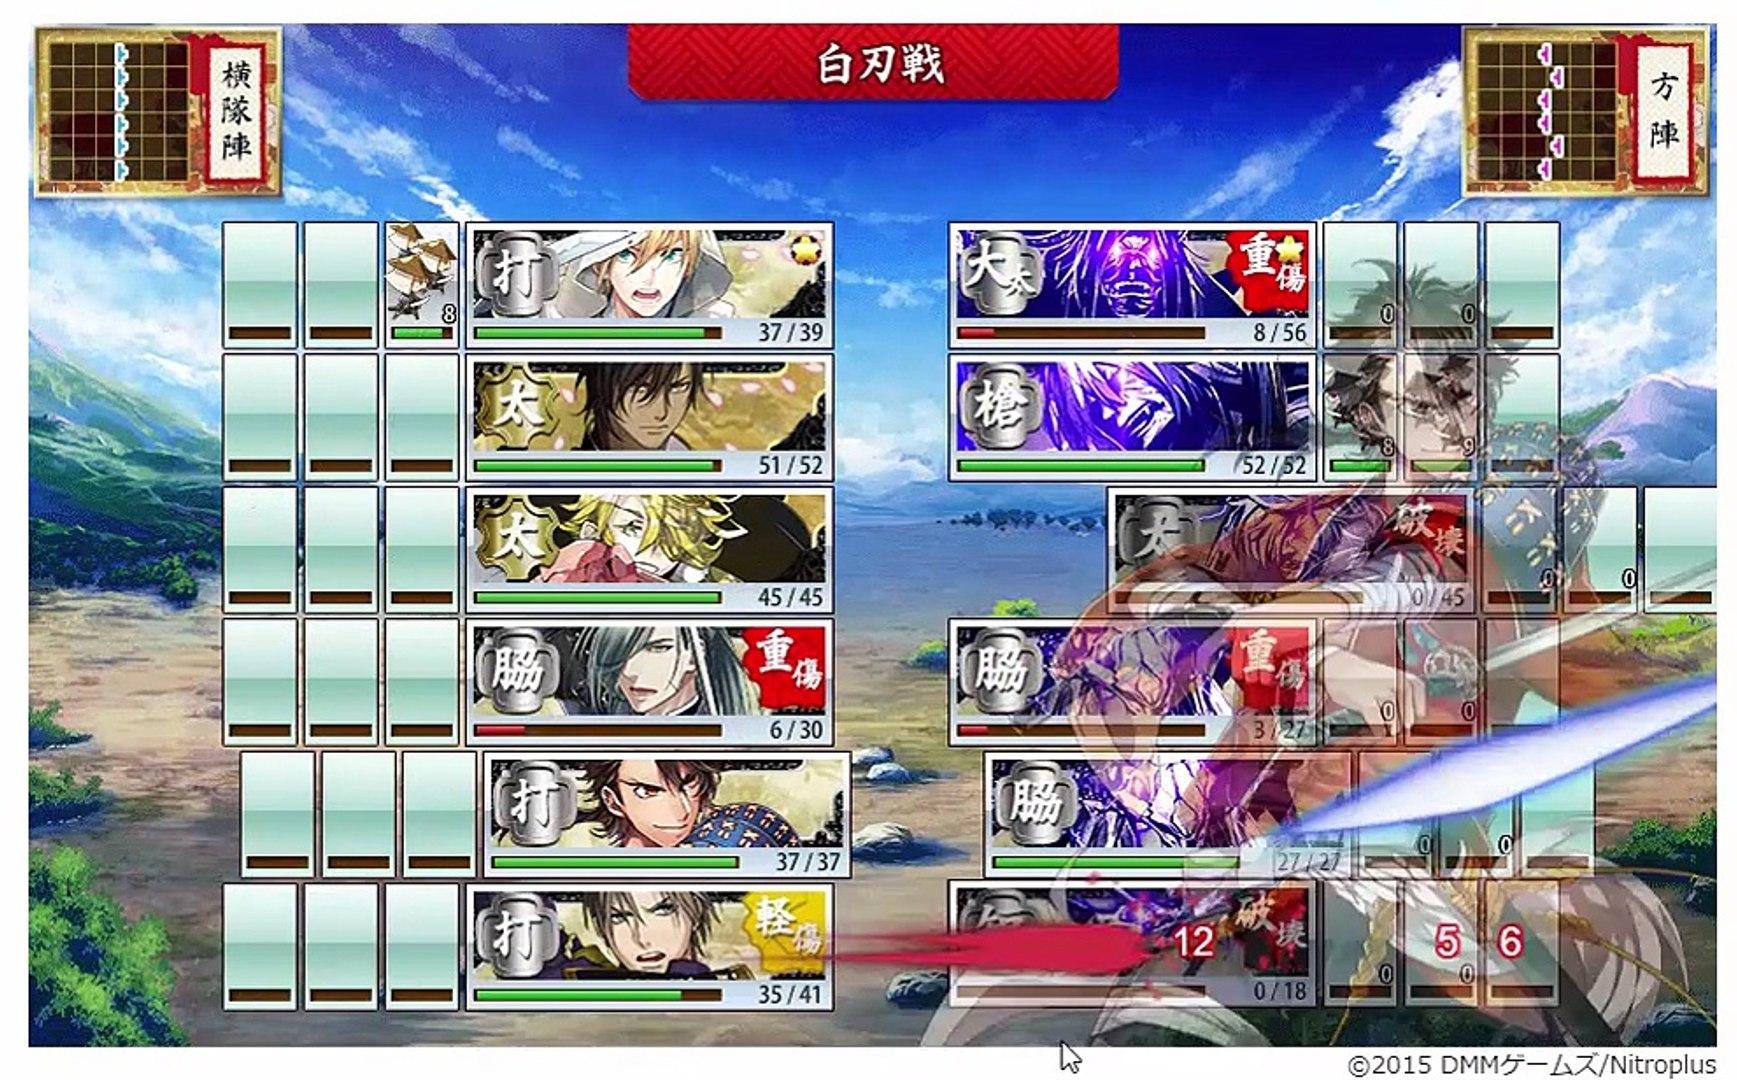 Gameplay] Touken Ranbu - 01 - video Dailymotion